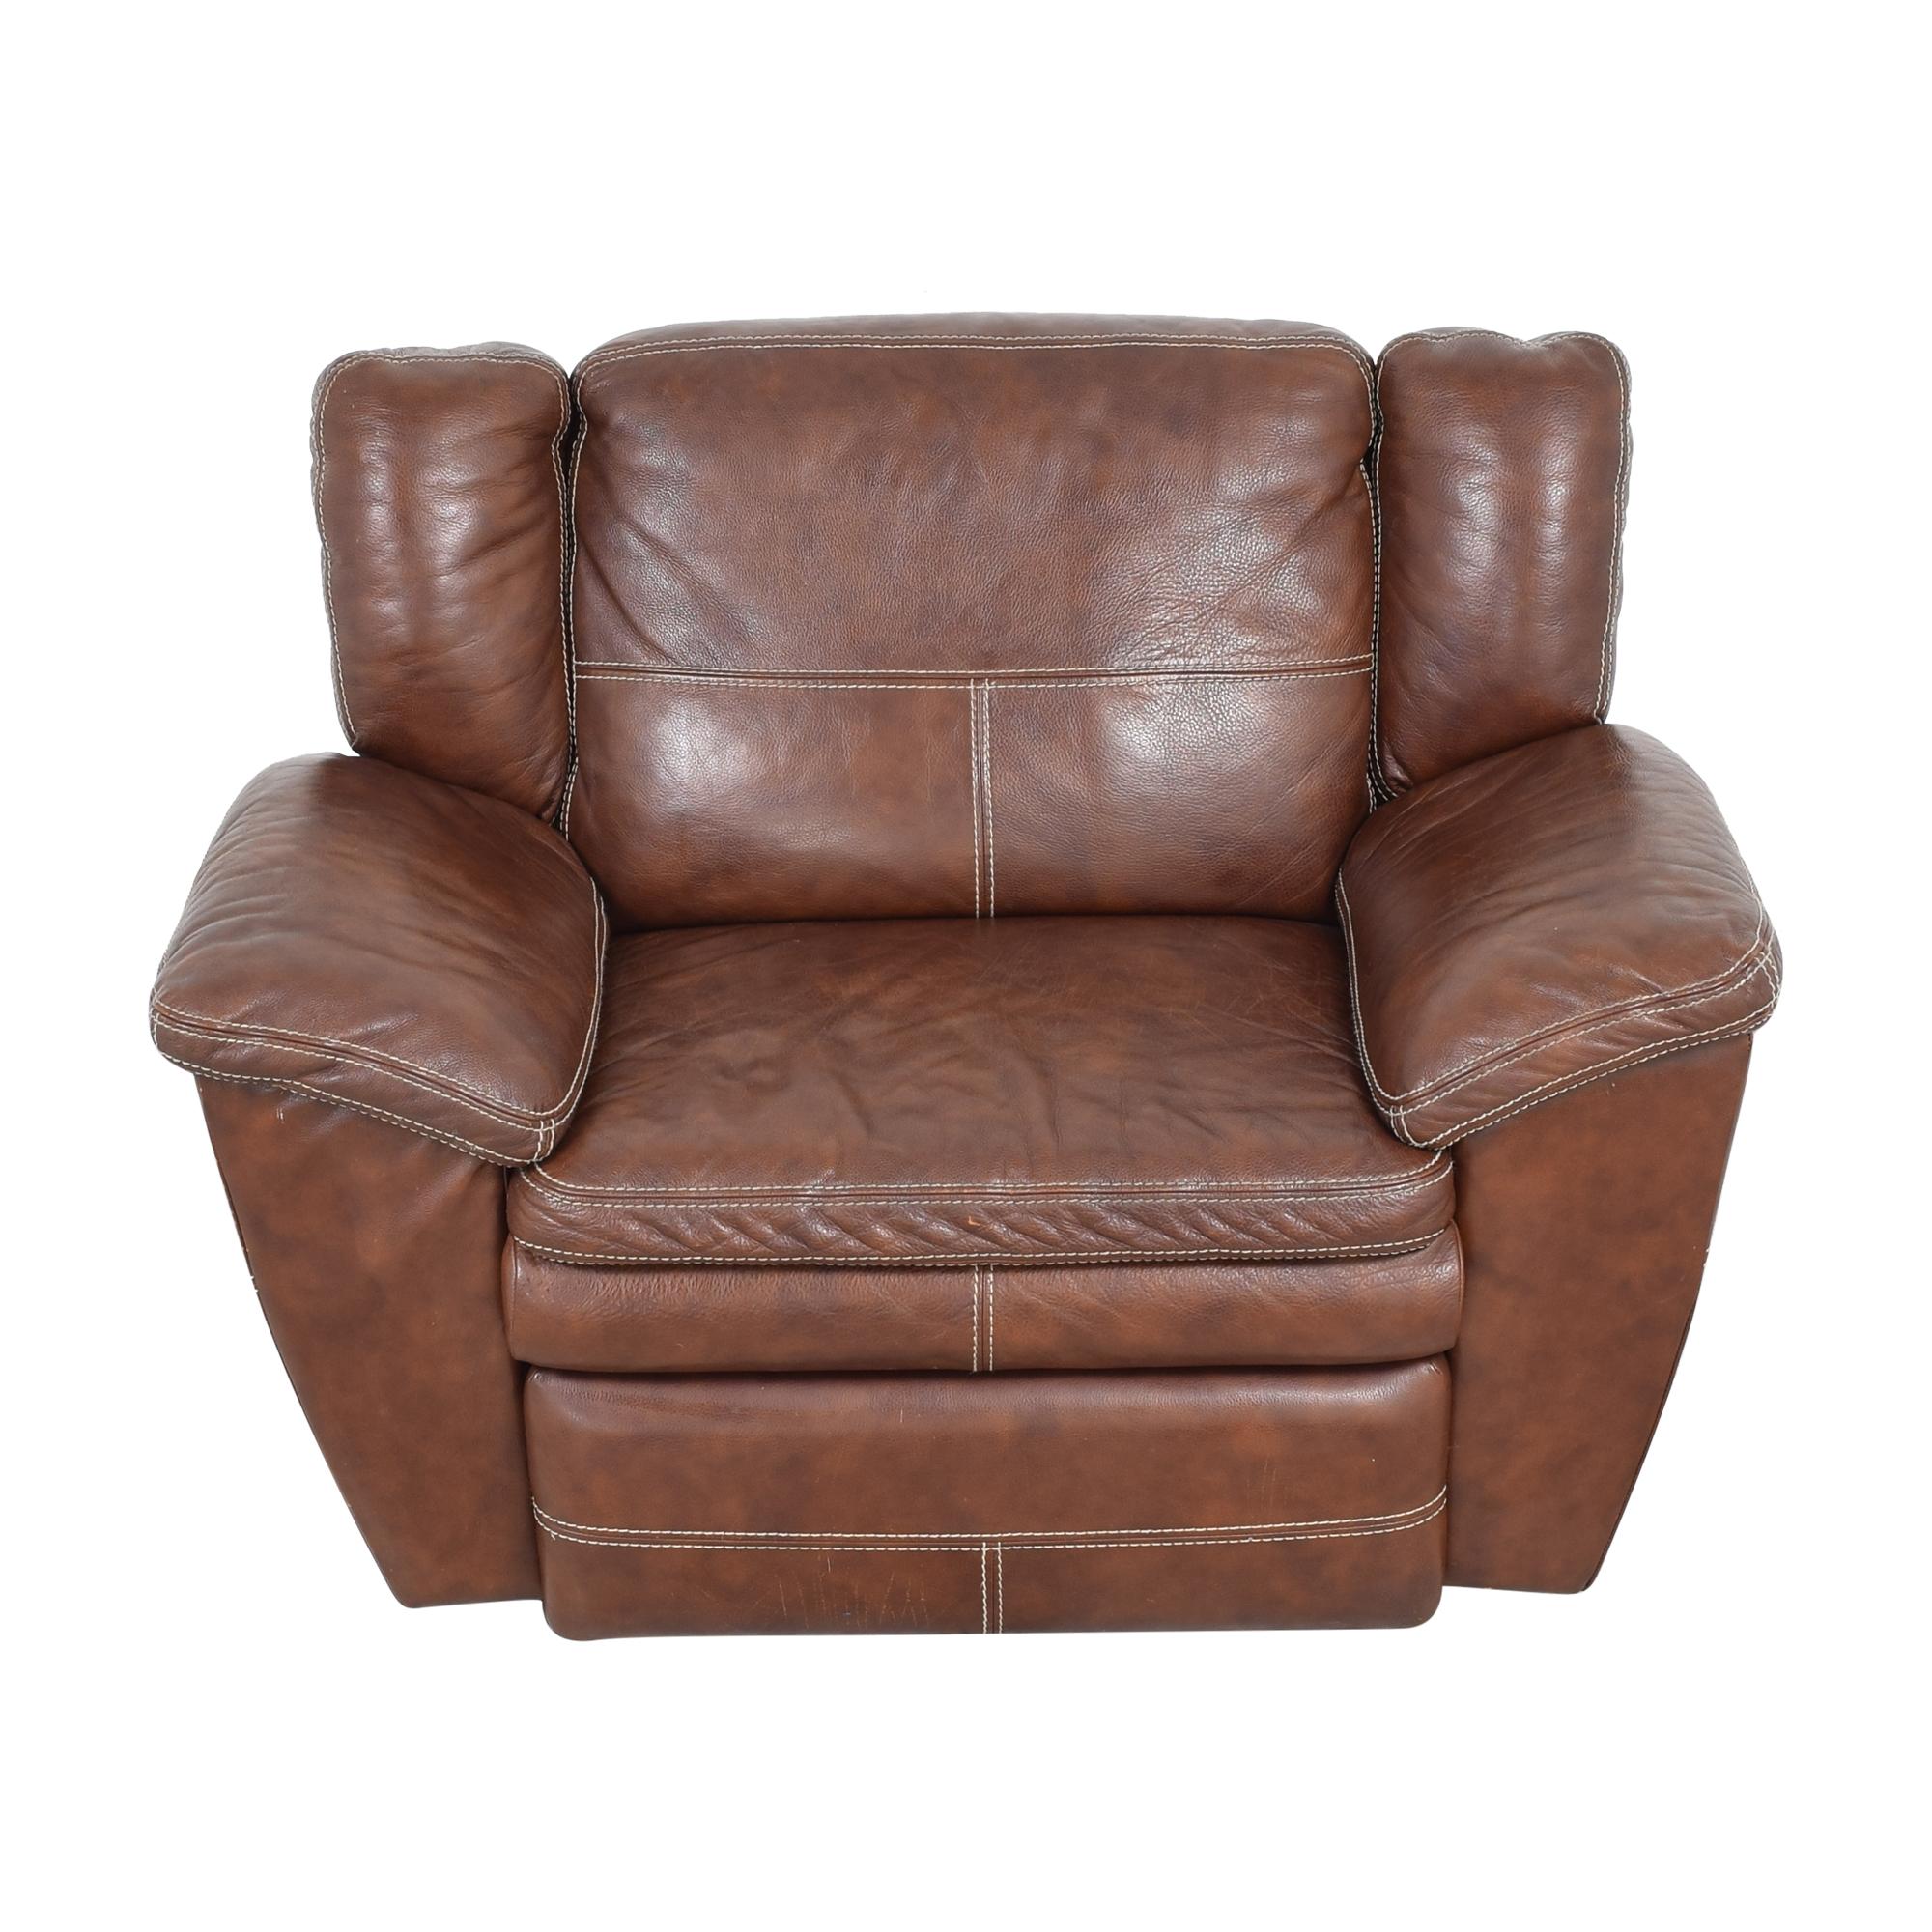 La-Z-Boy La-Z-Boy Leather Recliner Chair discount